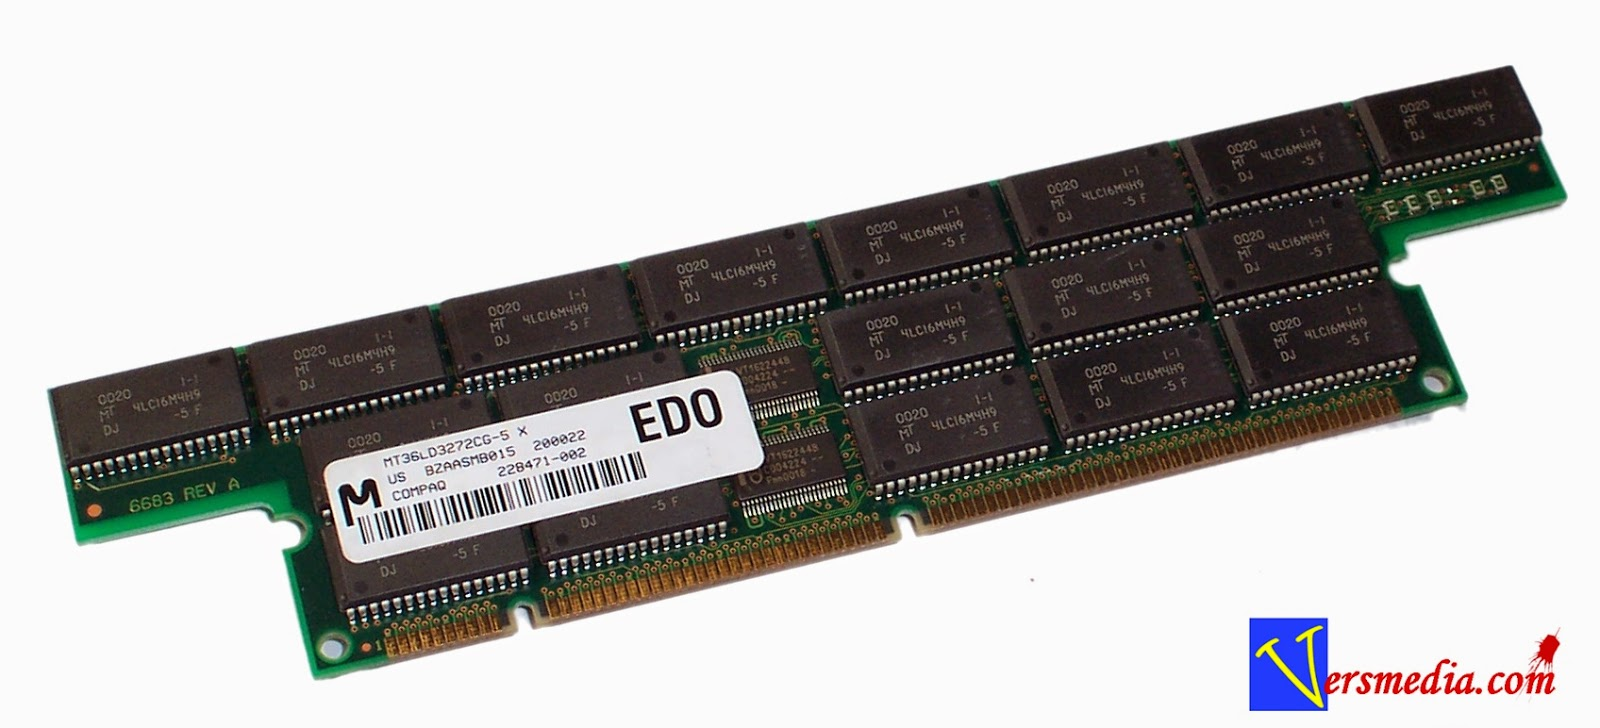 EDO RAM Extended Data Out Random Access Memory